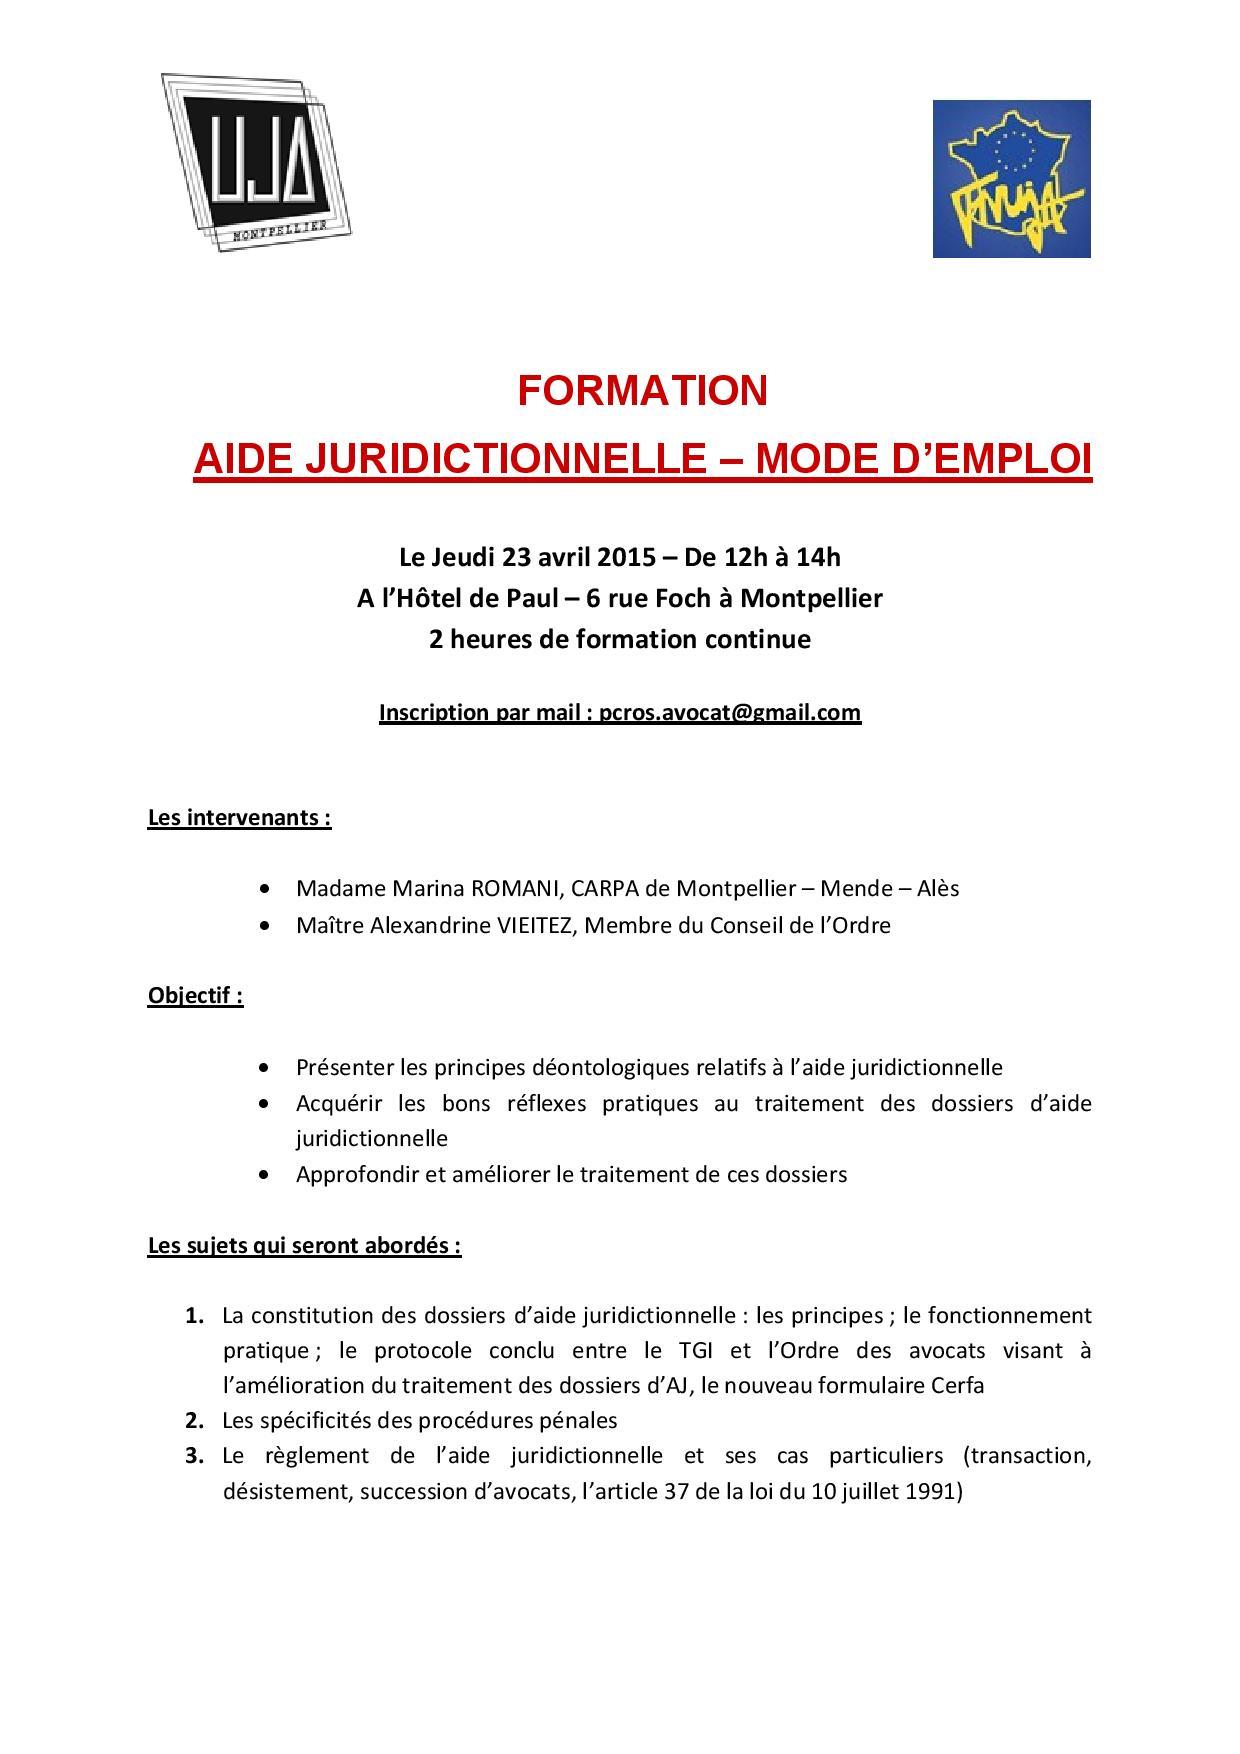 MONTPELLIER: FORMATION: AIDE JURIDICTIONNELLE – MODE D'EMPLOI